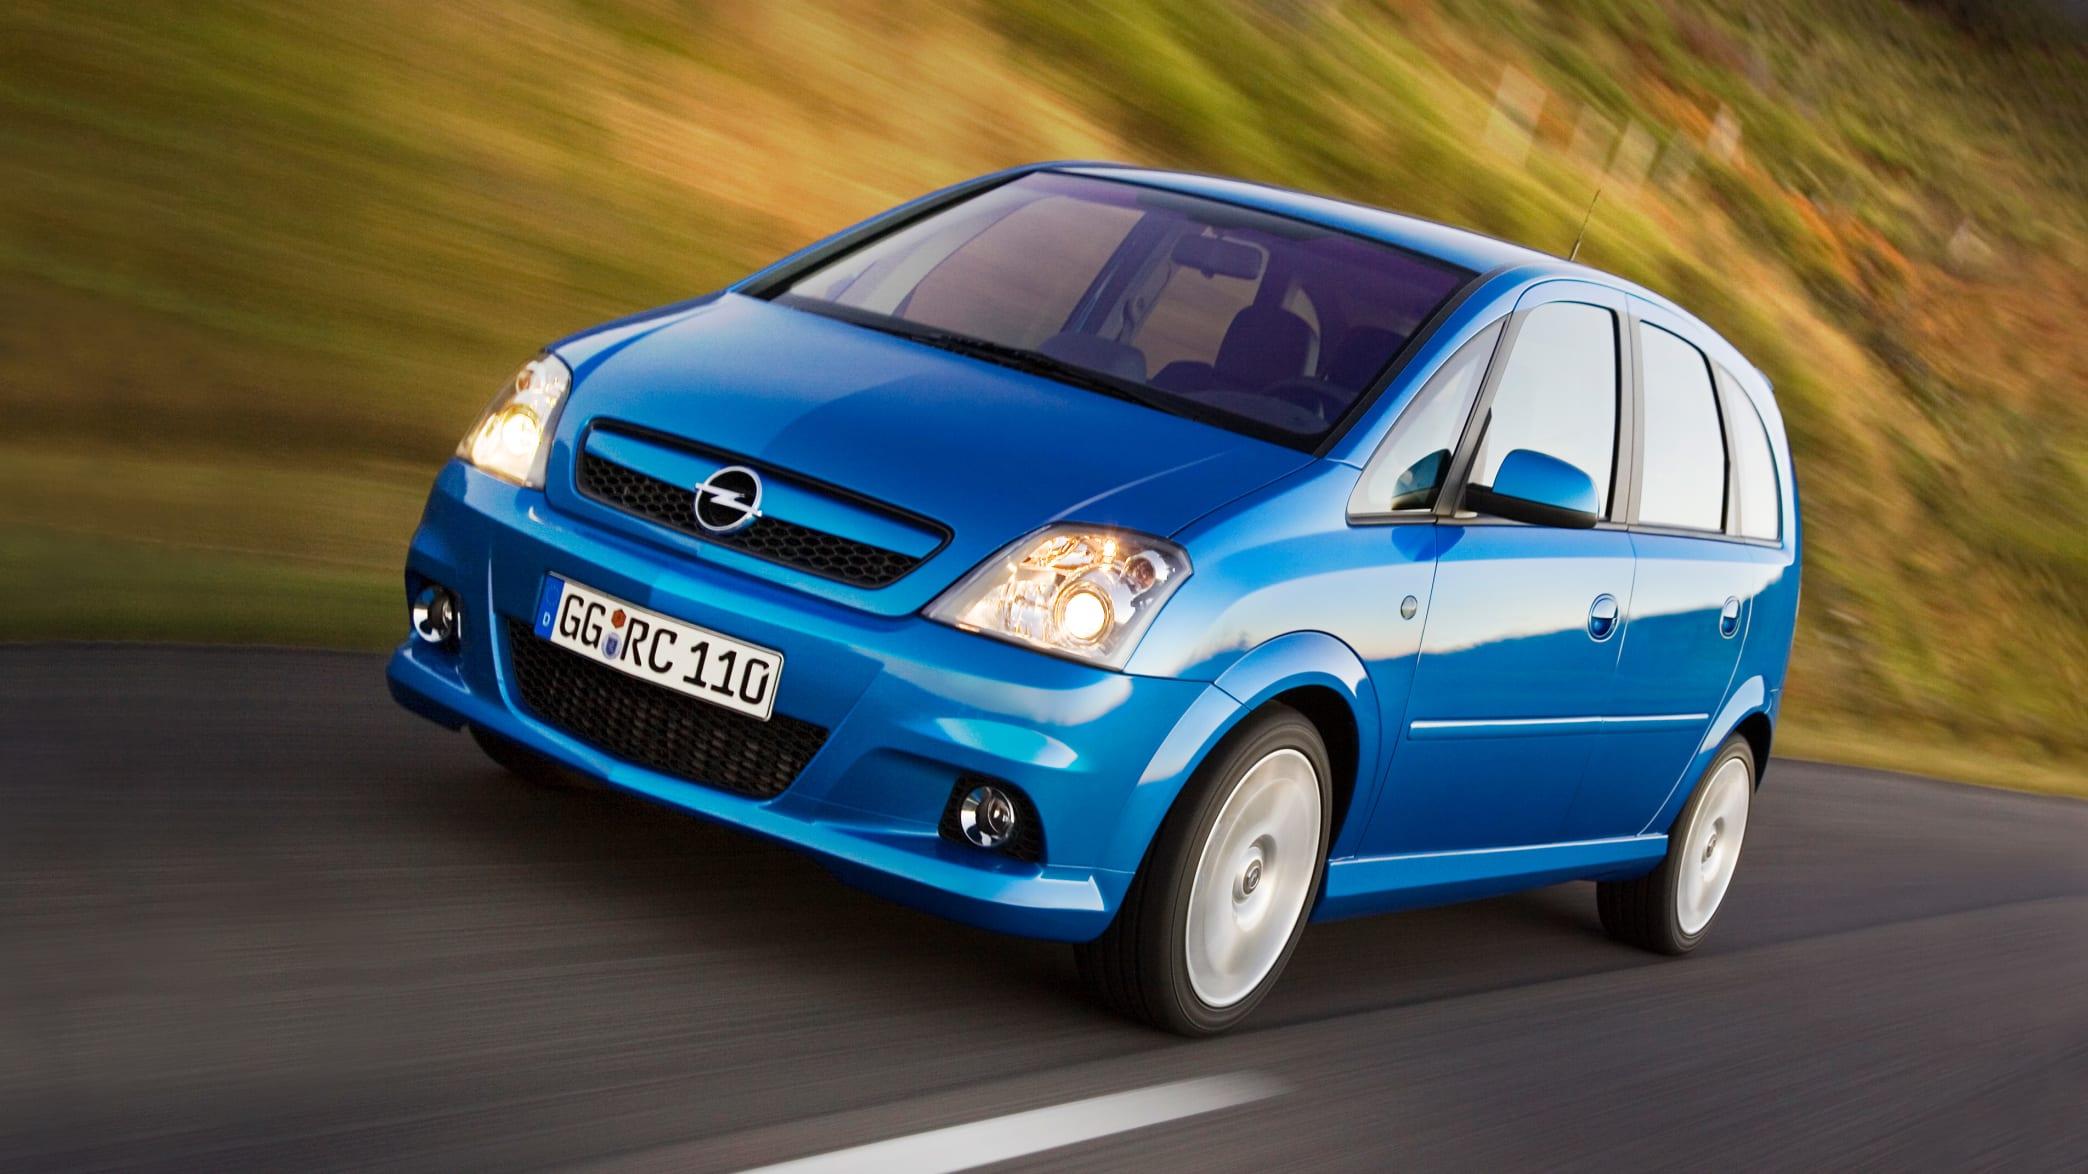 Blauer Opel Meriva OPC fährt auf Strasse